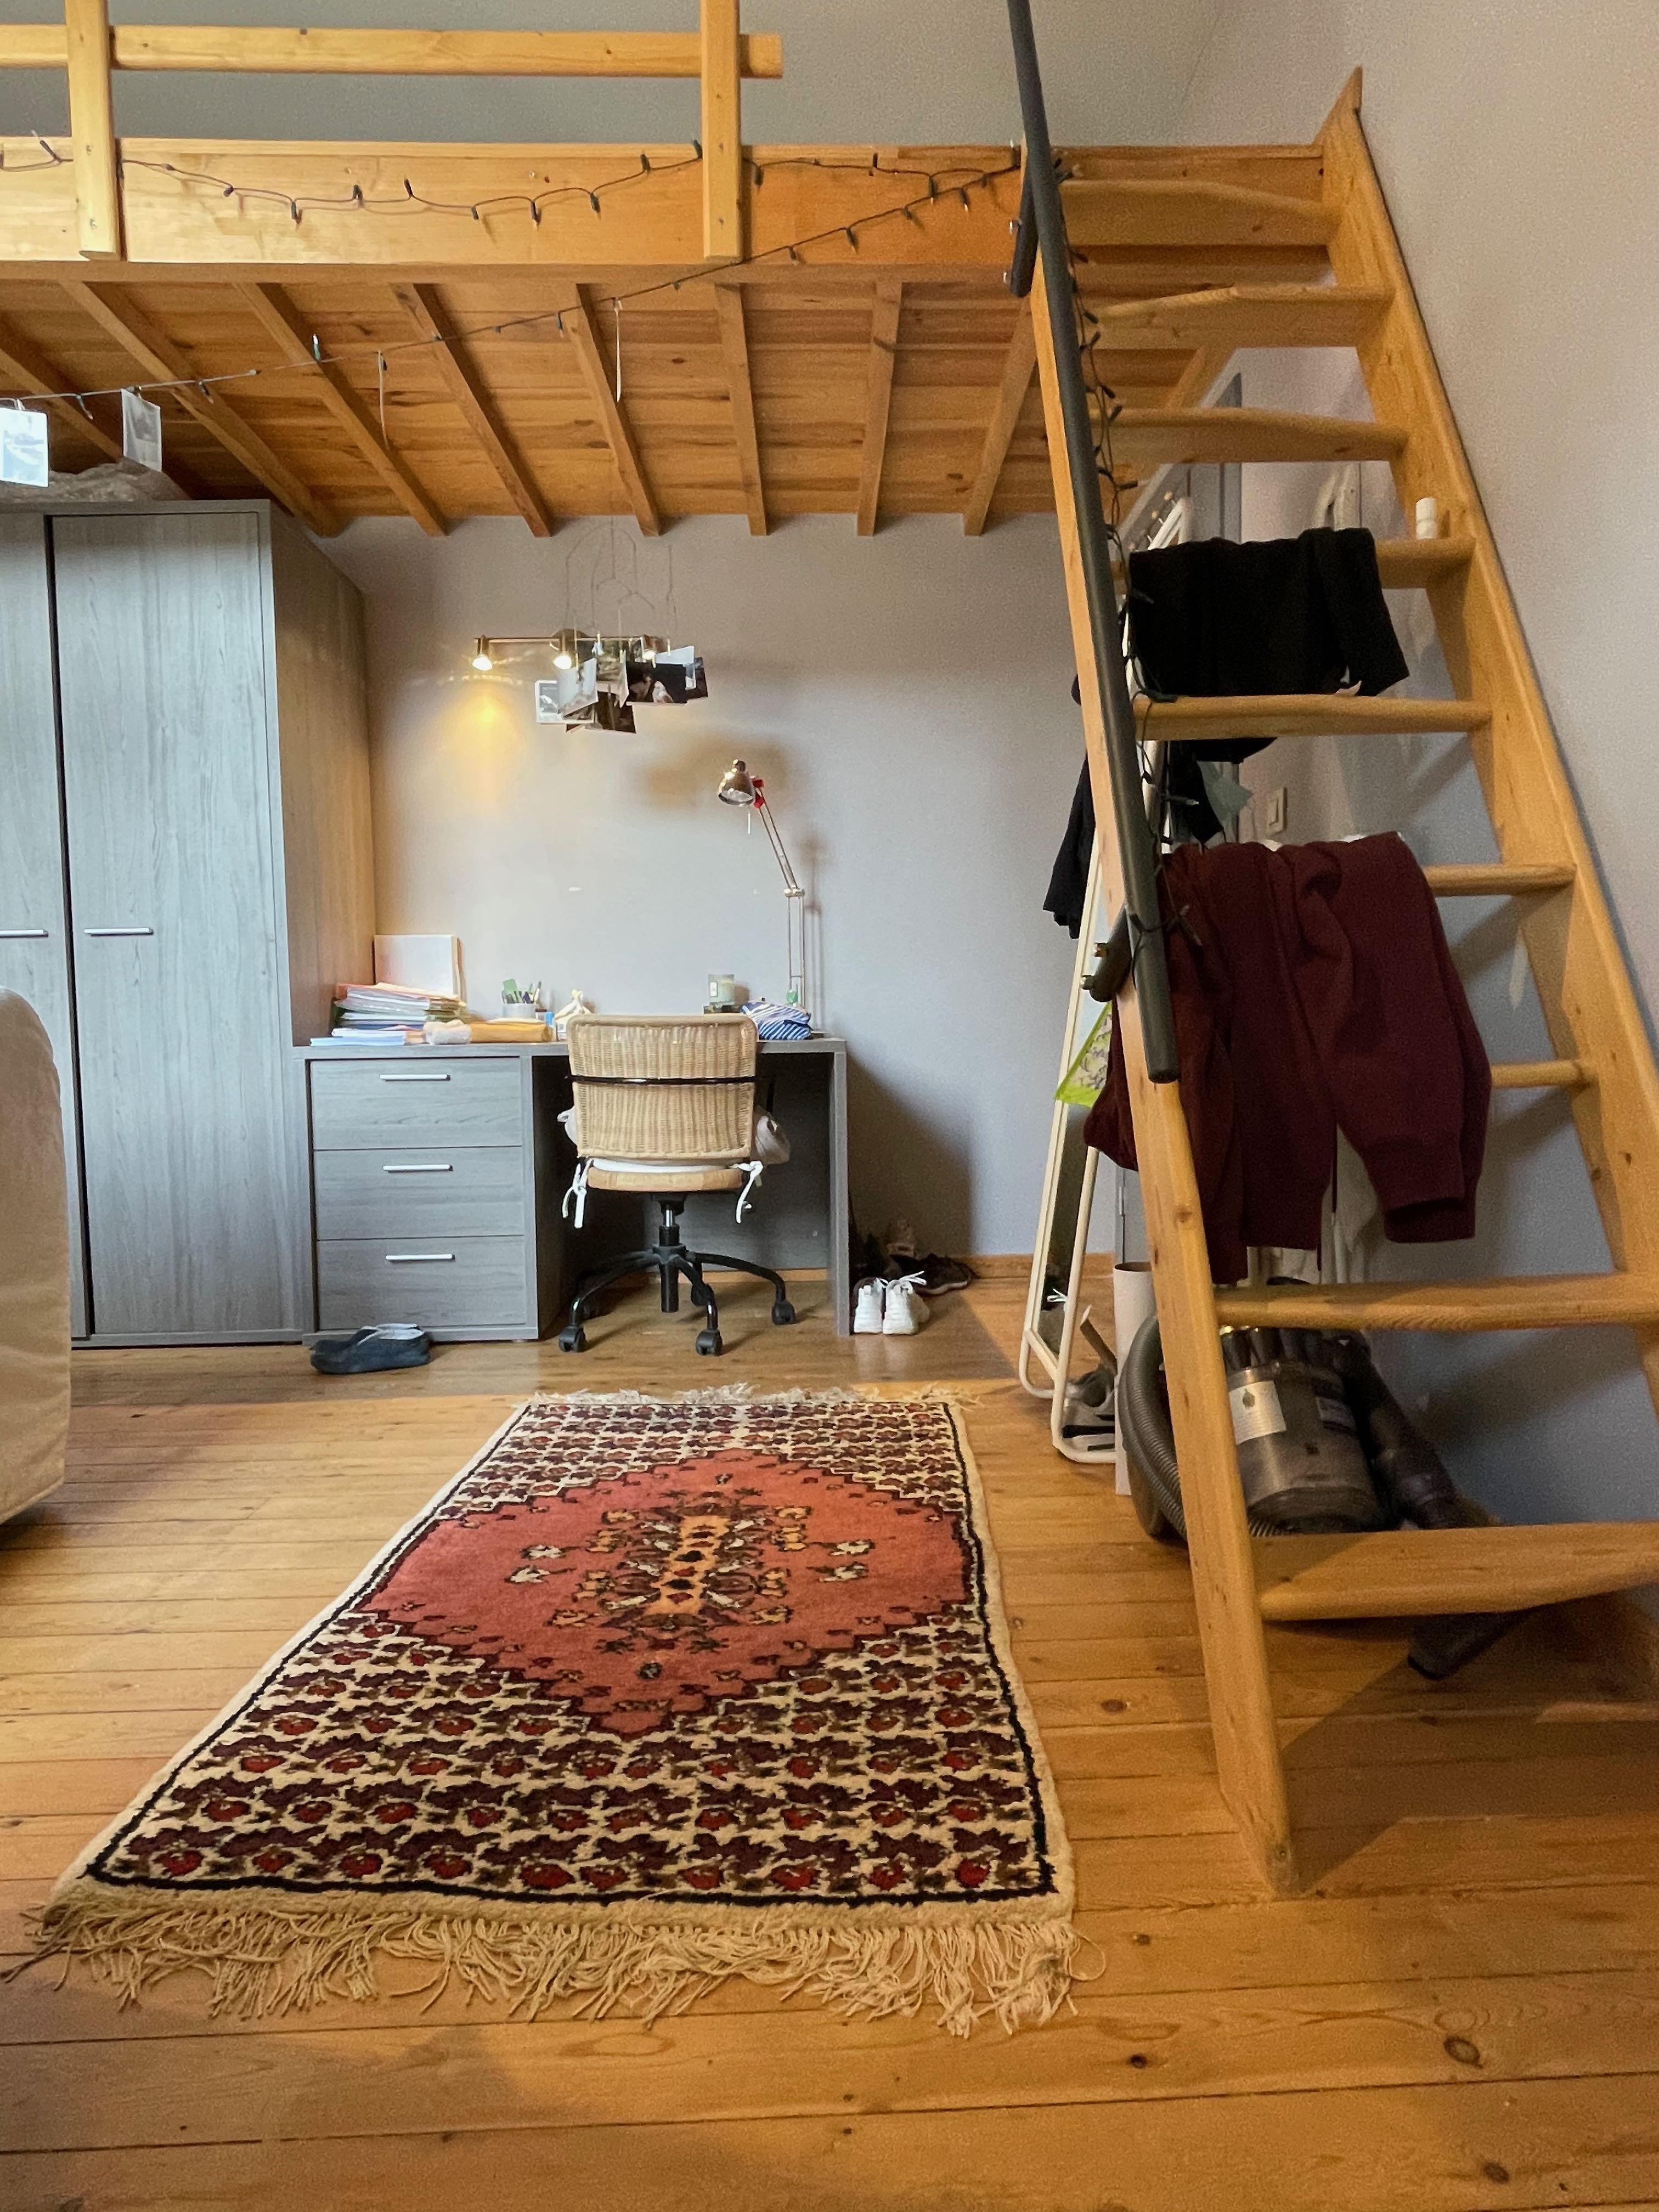 DB3-0201 - trap hoogslaper, bureau, mat.